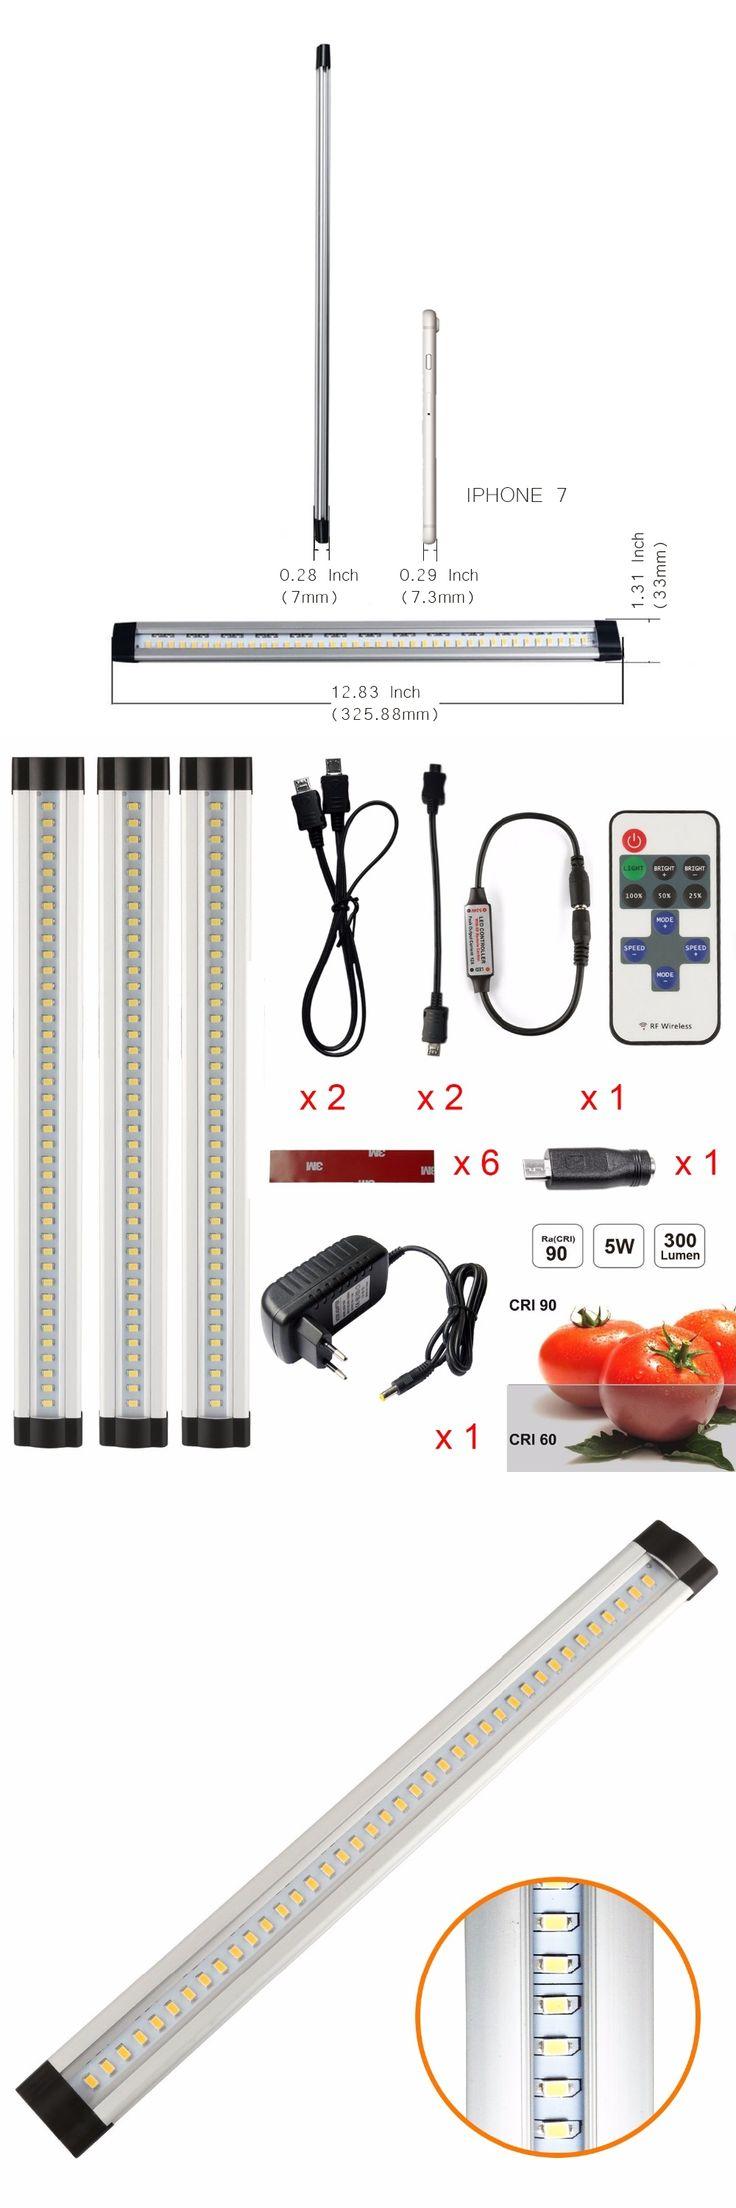 UnvarySam DC12V 3pcs/set IR remote control Dimmable UNDER CABINET LIGHT Kitchen Wardrobe Cupboard Closet  Light LED bar light